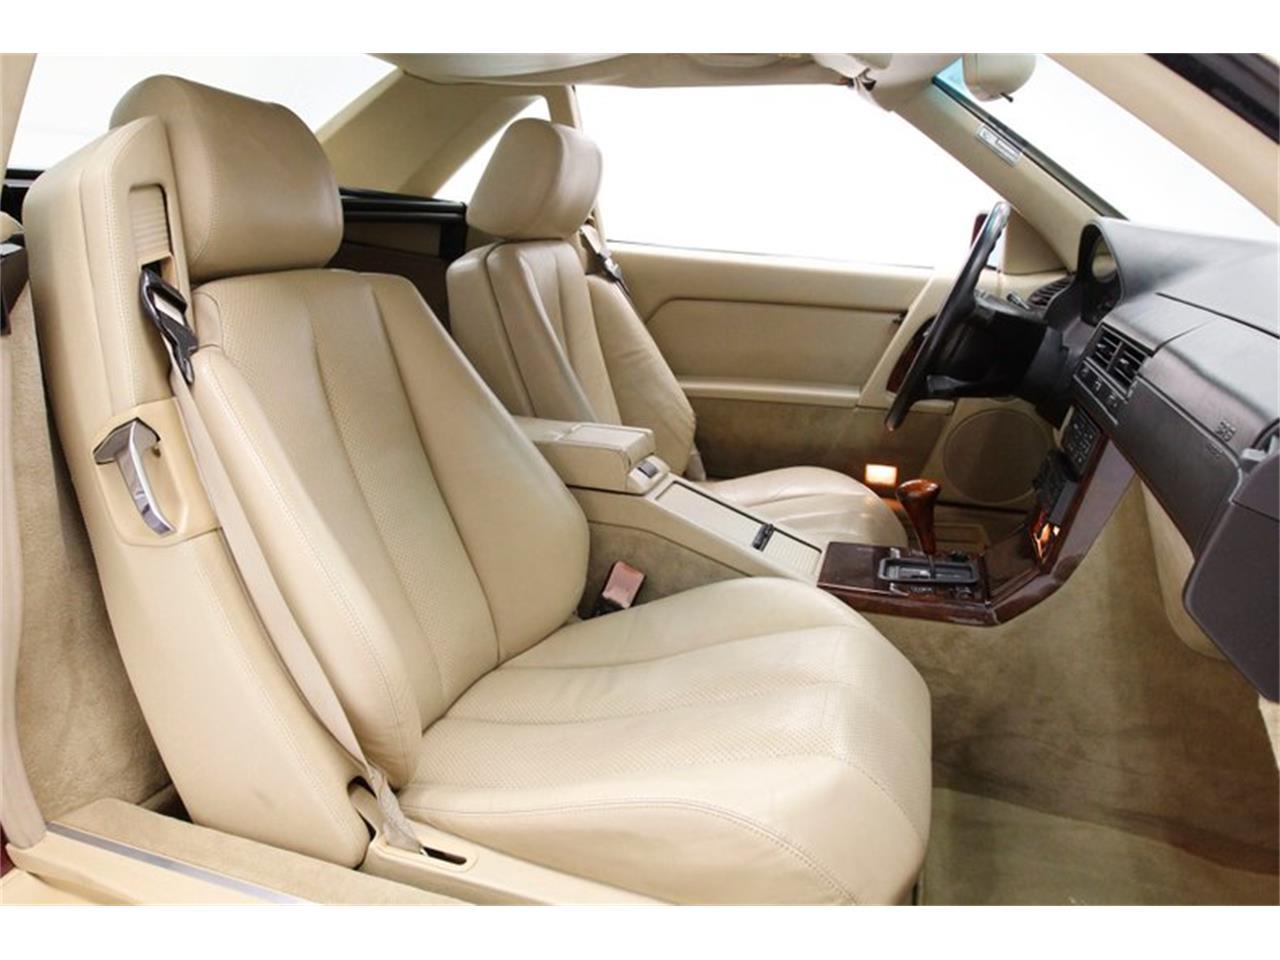 1990 Mercedes-Benz 300SL (CC-1163364) for sale in Morgantown, Pennsylvania